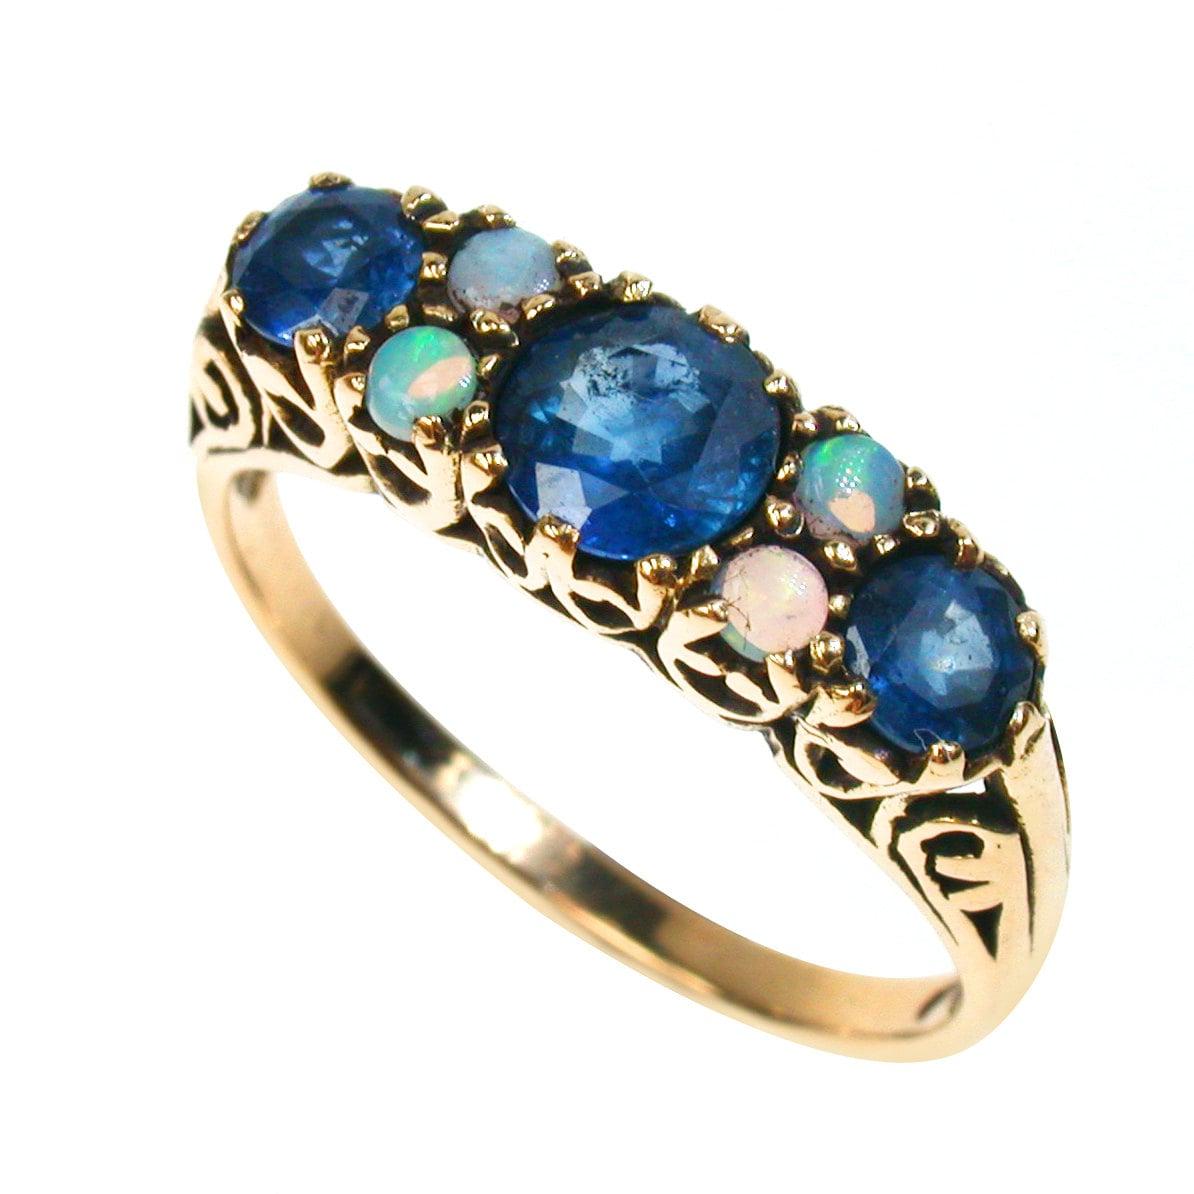 vintage sapphire ring 9ct gold opal ring antique style 9k 10k. Black Bedroom Furniture Sets. Home Design Ideas